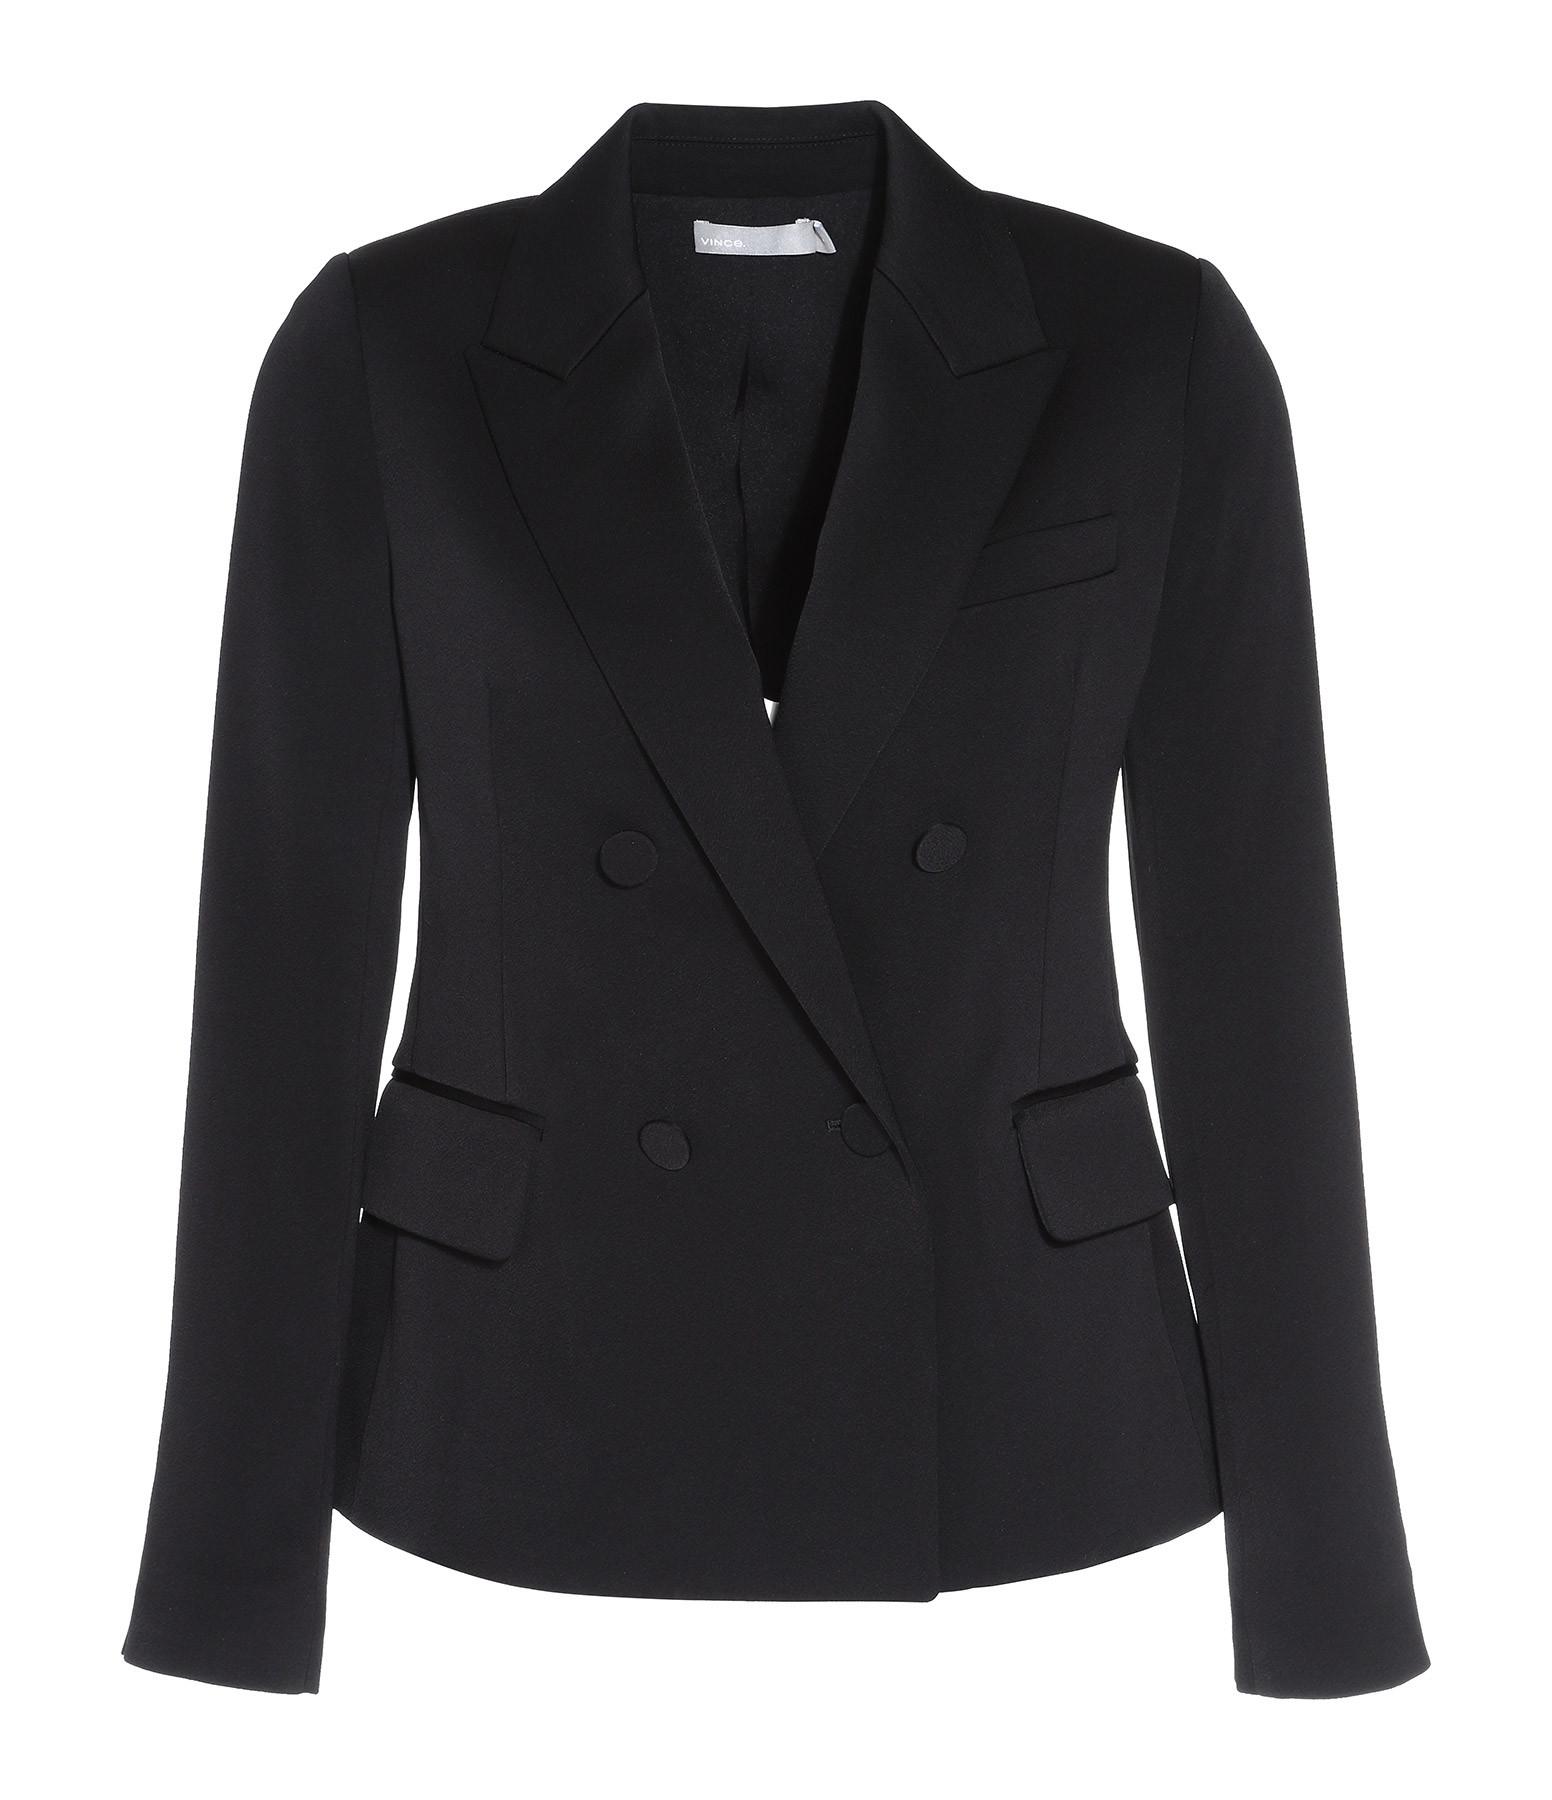 VINCE - Blazer Tuxedo Noir